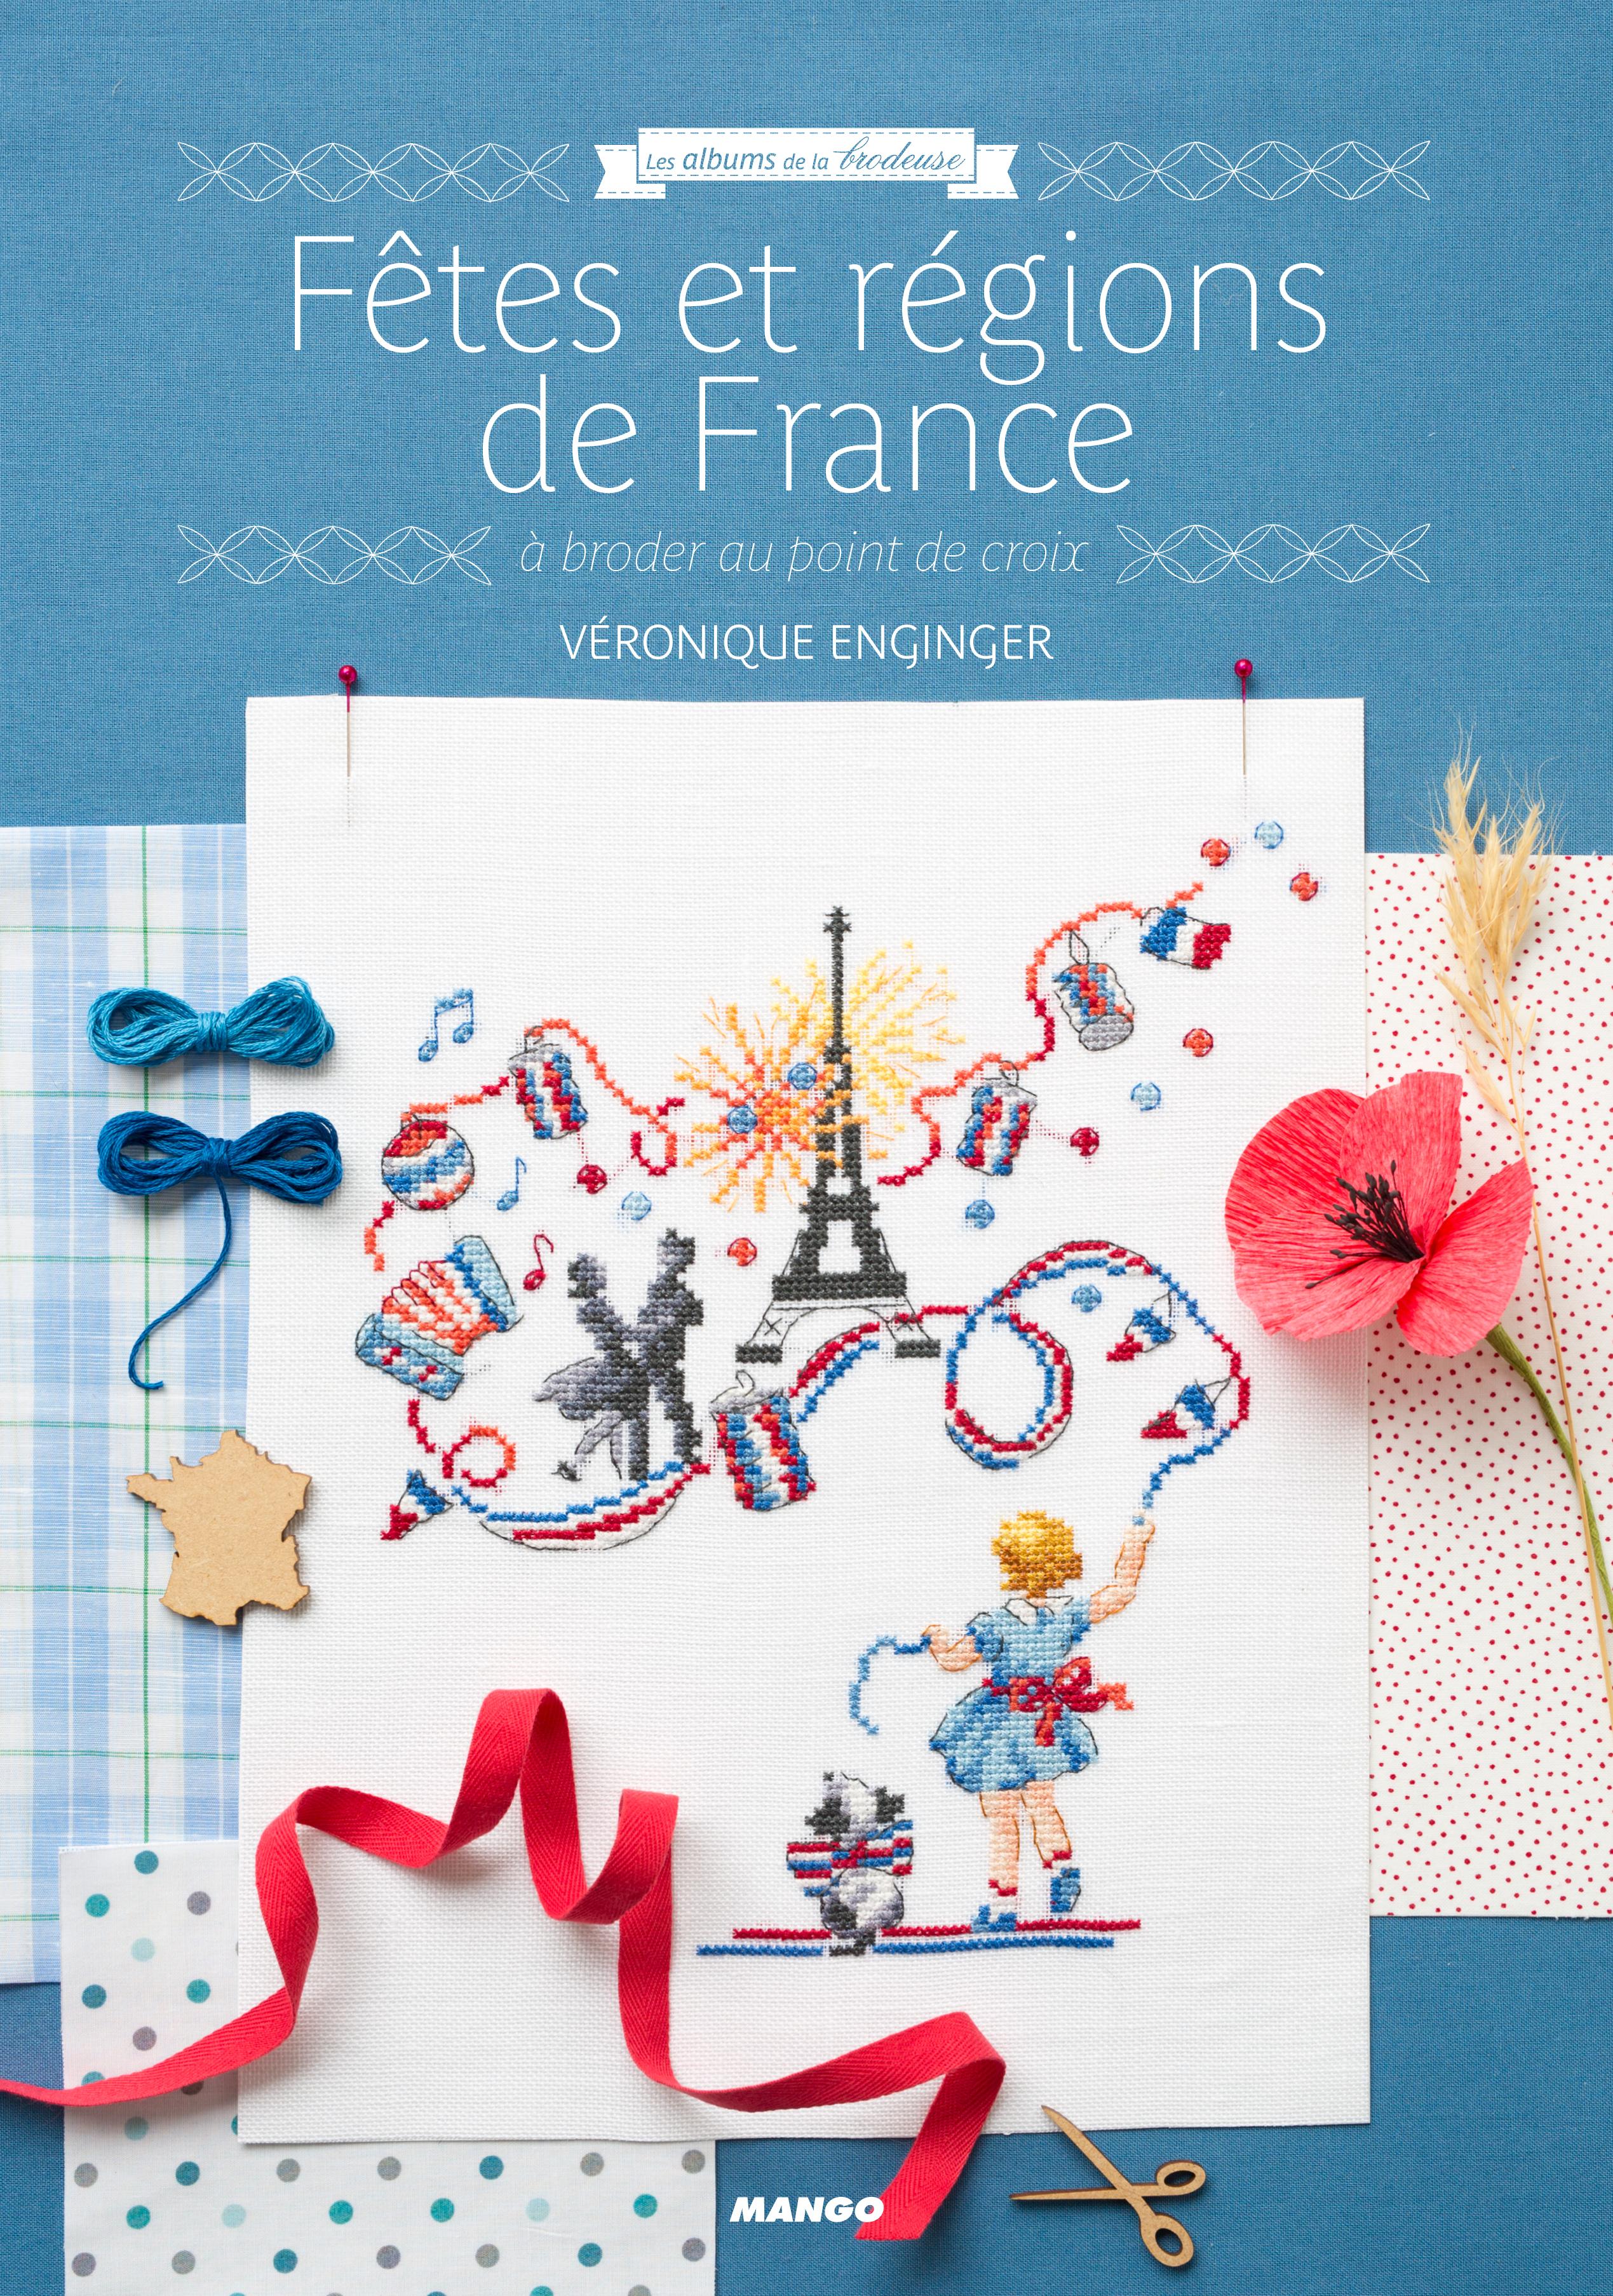 FETES ET REGIONS DE FRANCE